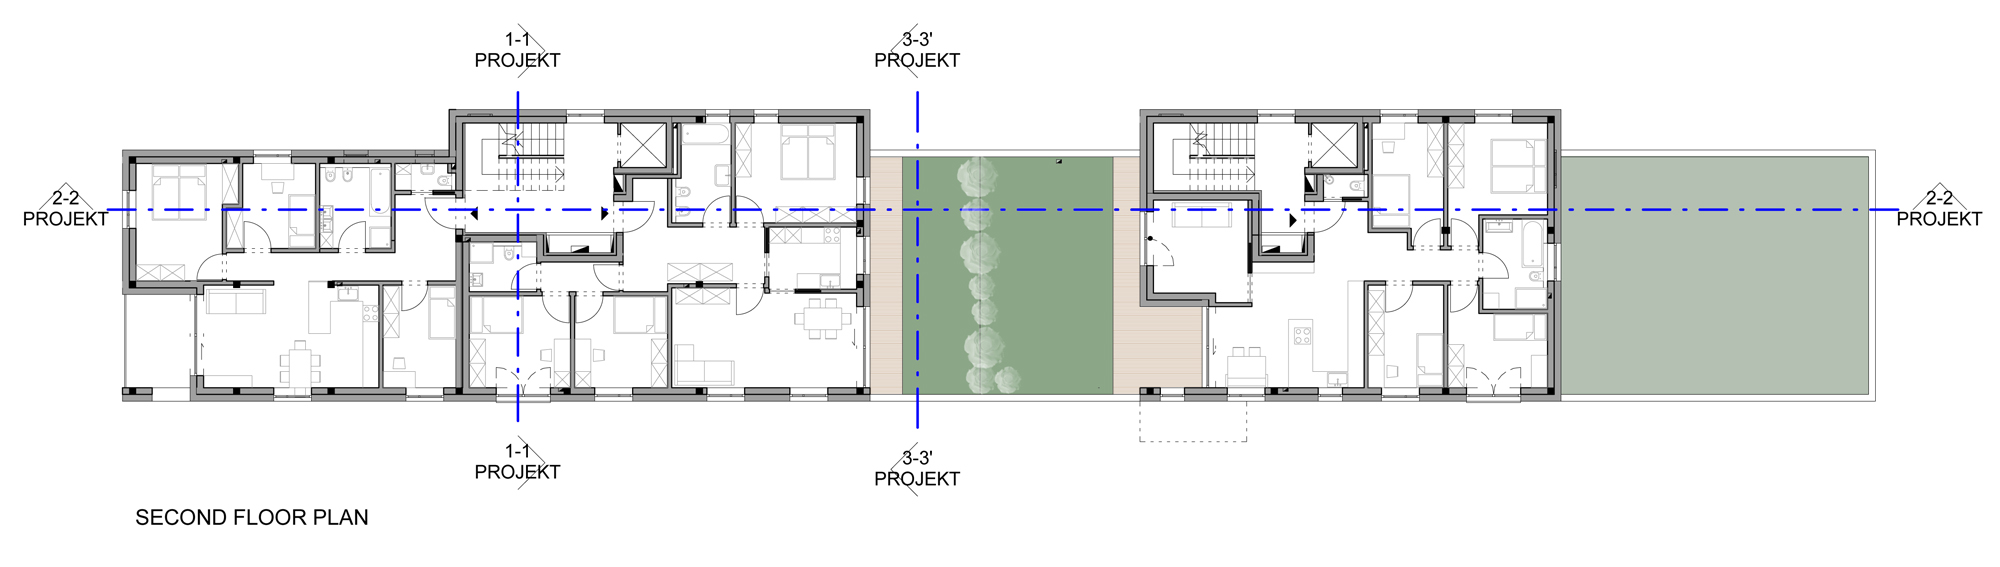 Plan of the Second Floor }